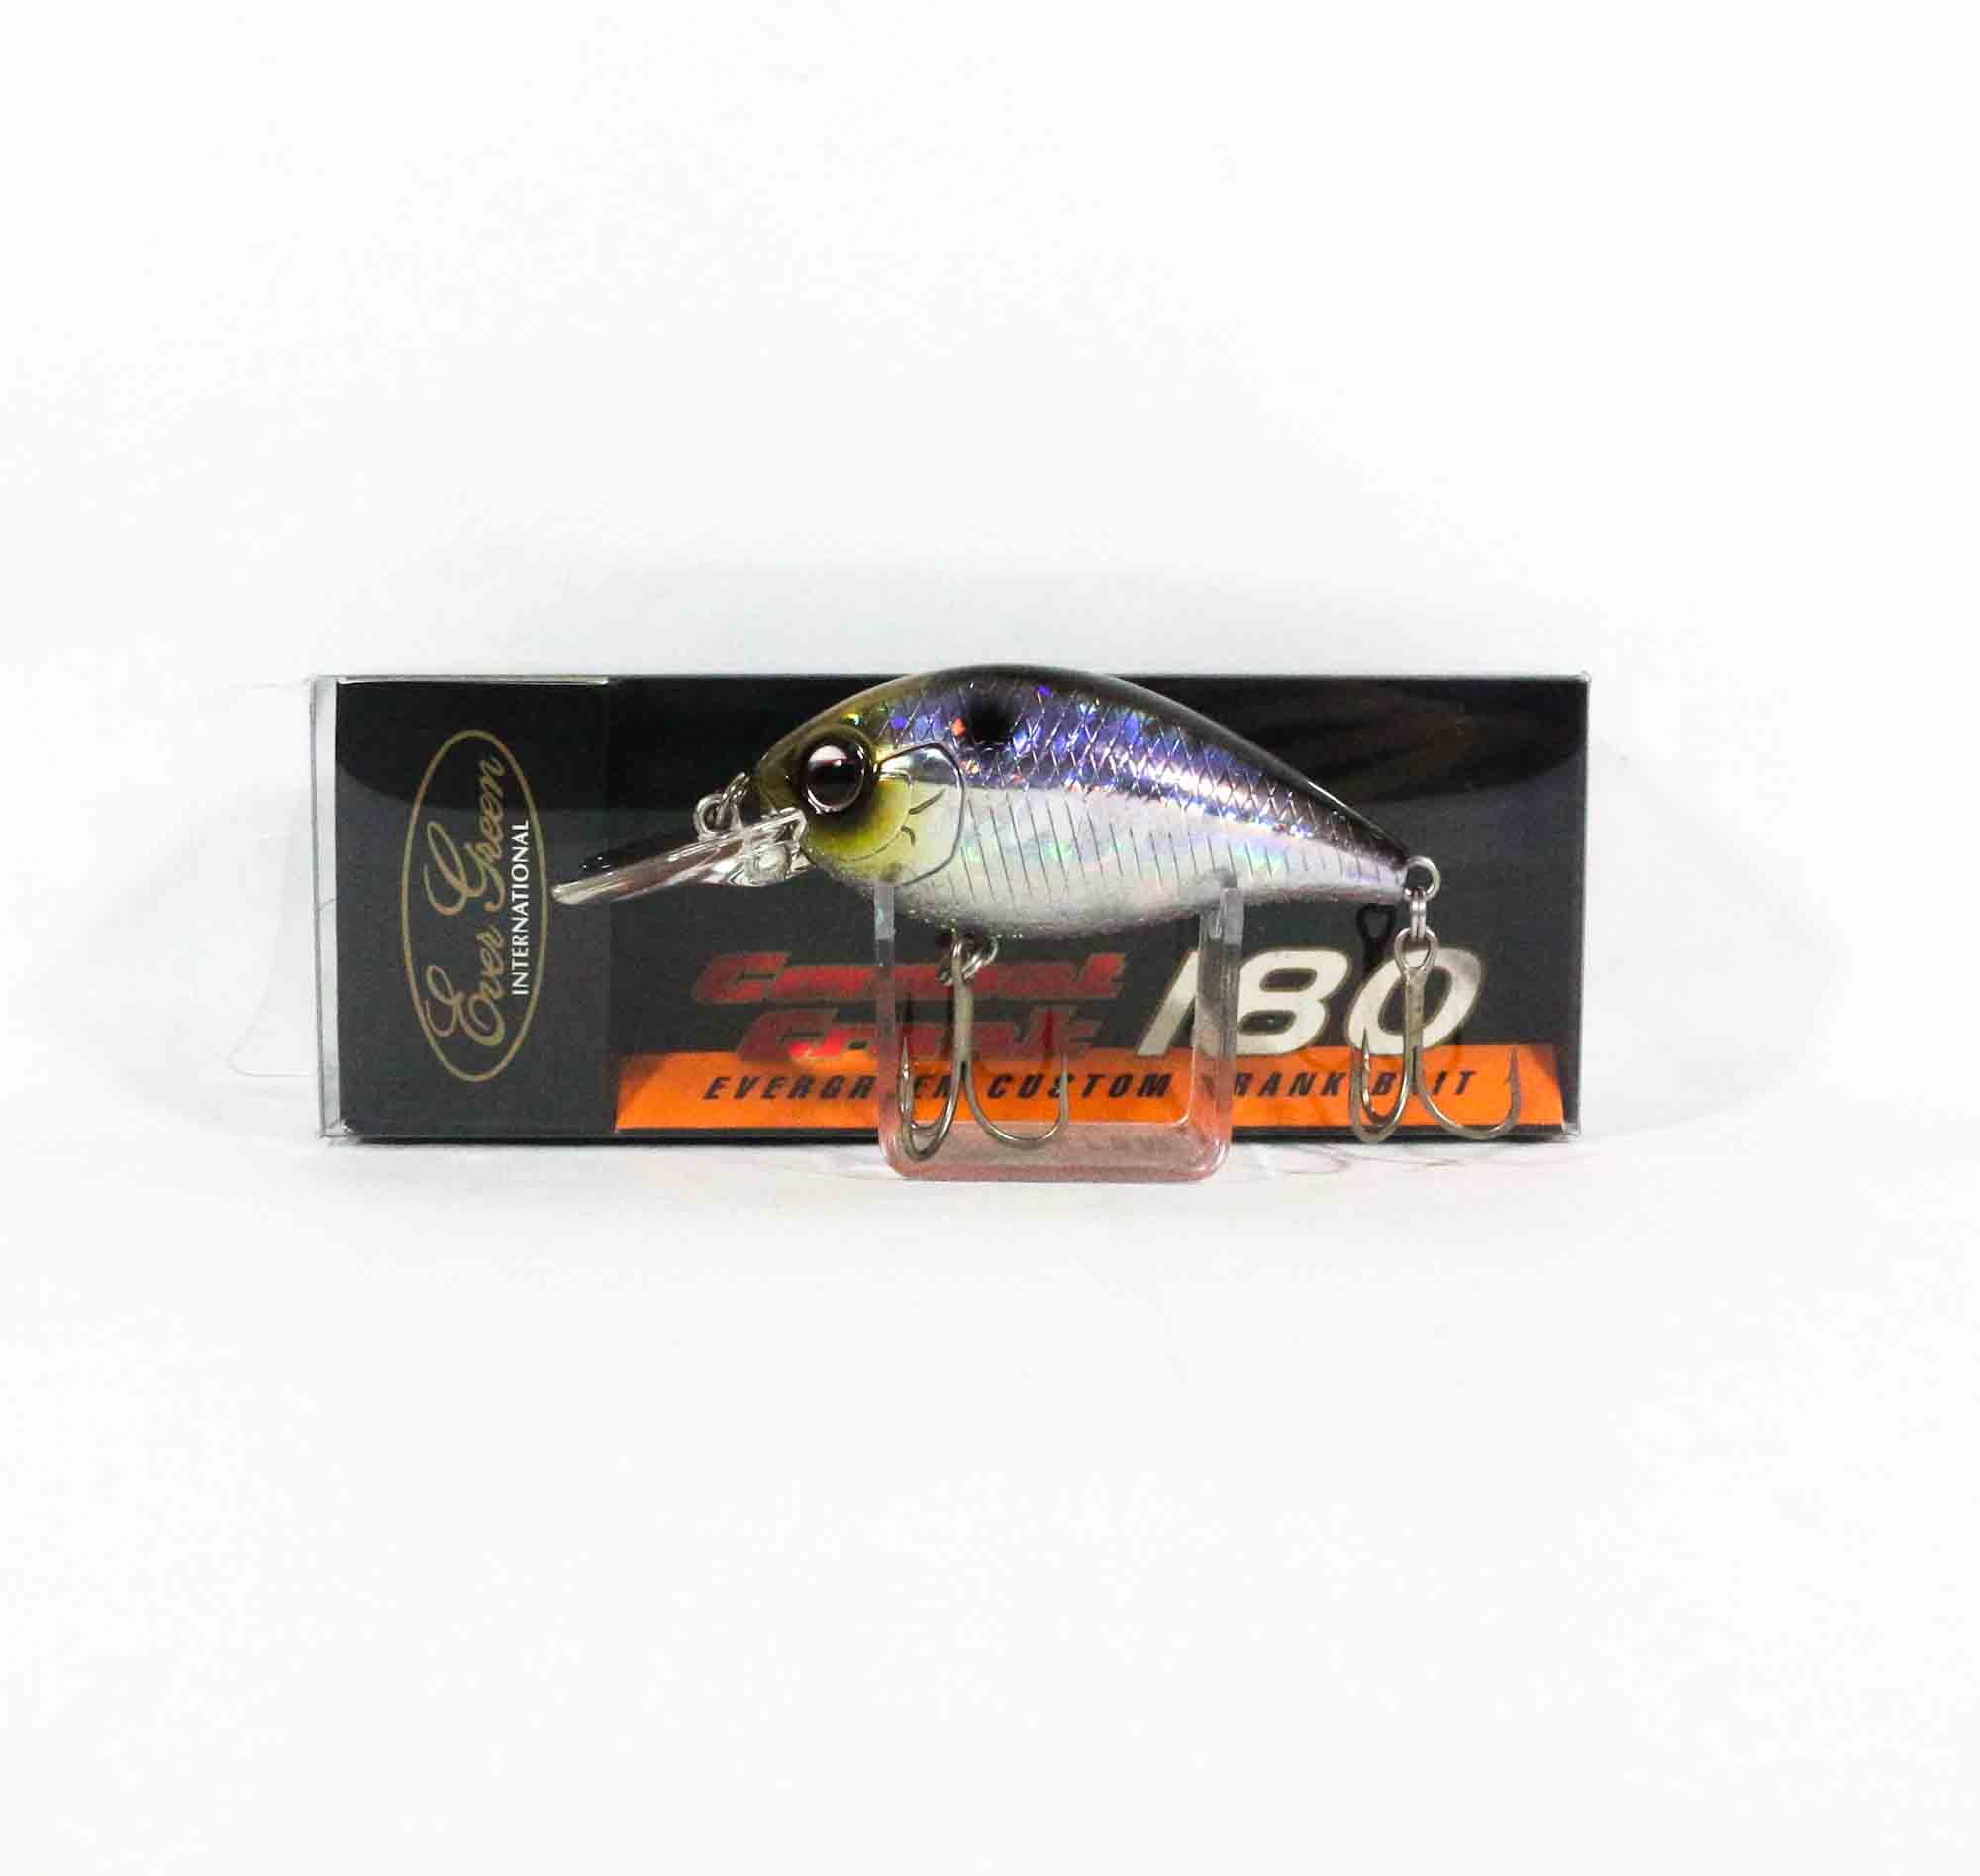 Evergreen Combat Crank 180 Floating Lure 209 (1547)